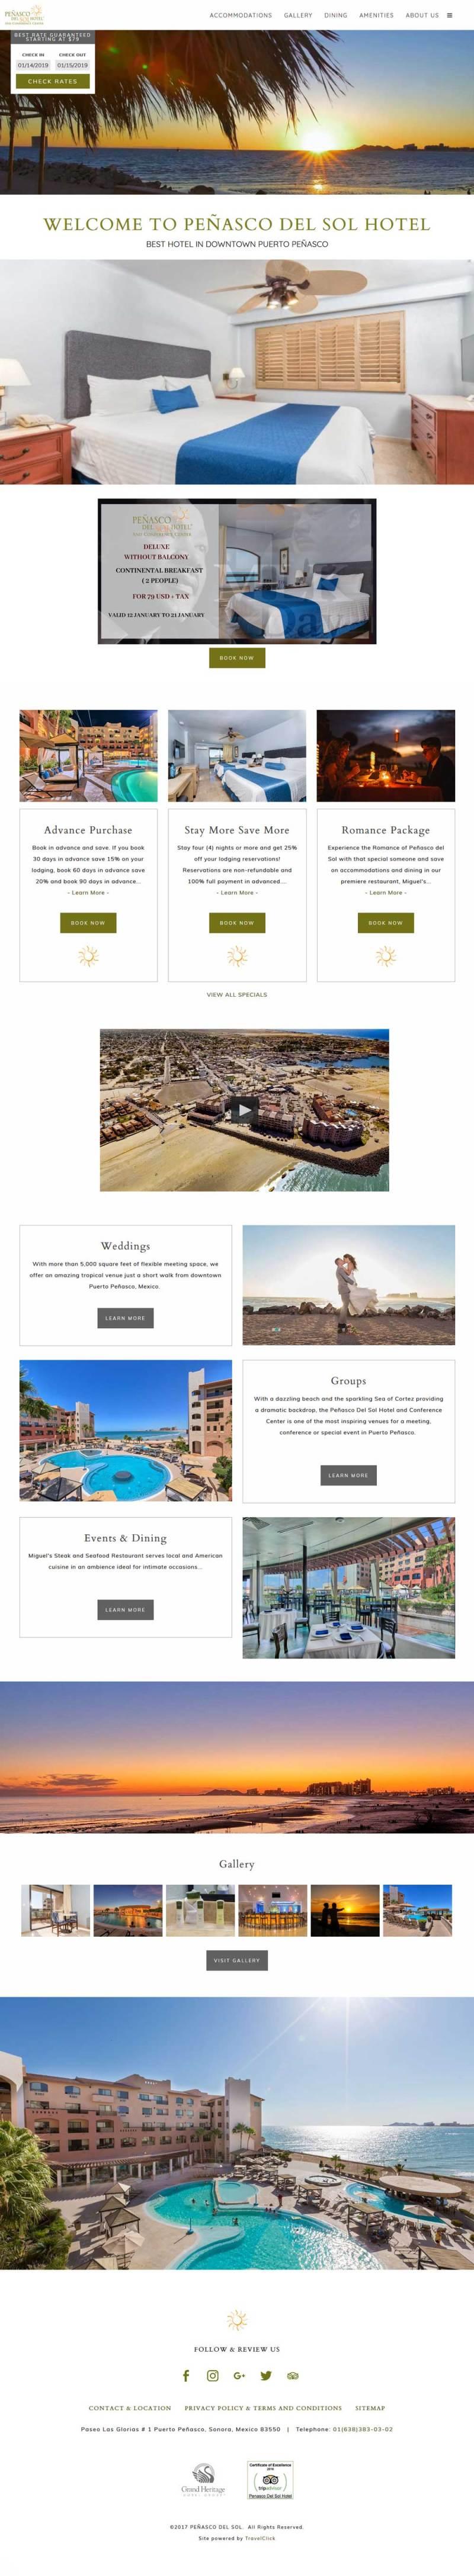 Hotel Penasco Del Sol in Puerto Penasco (Rocky Point Mexico). Click here to visit the Penasco Del Sol website.